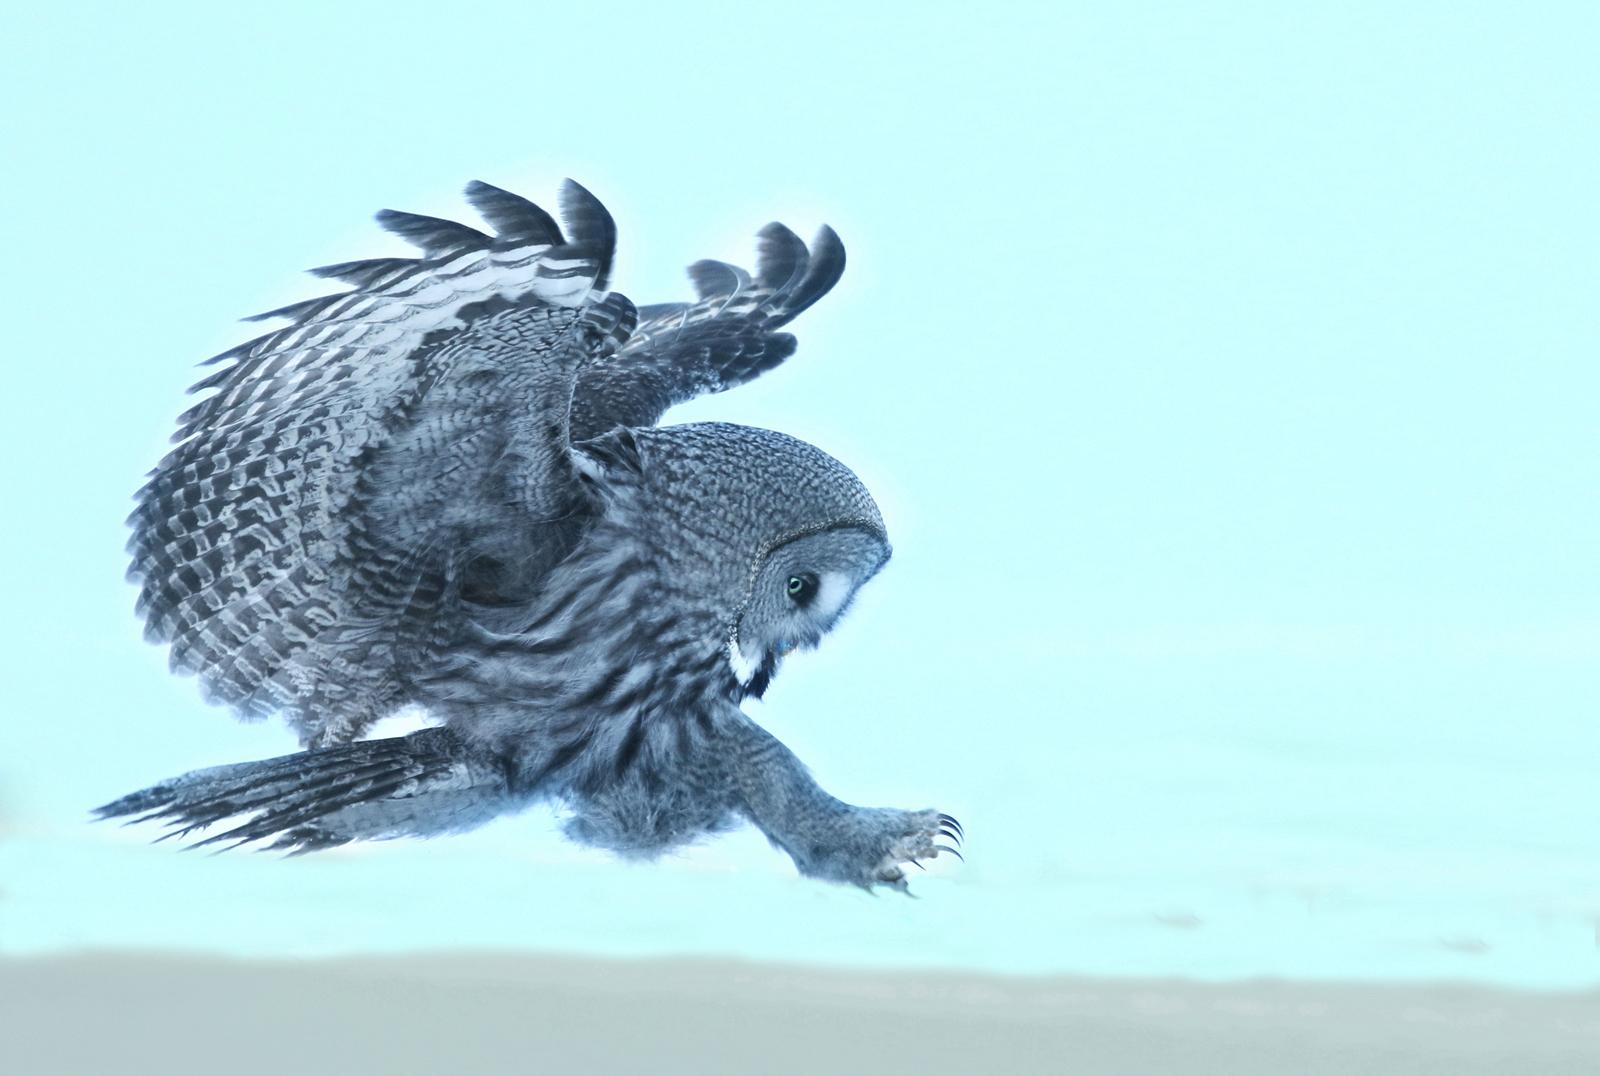 WILD_GREAT_GREY_OWL_HUNTING_IN_SNOW%255B1%255D.jpg